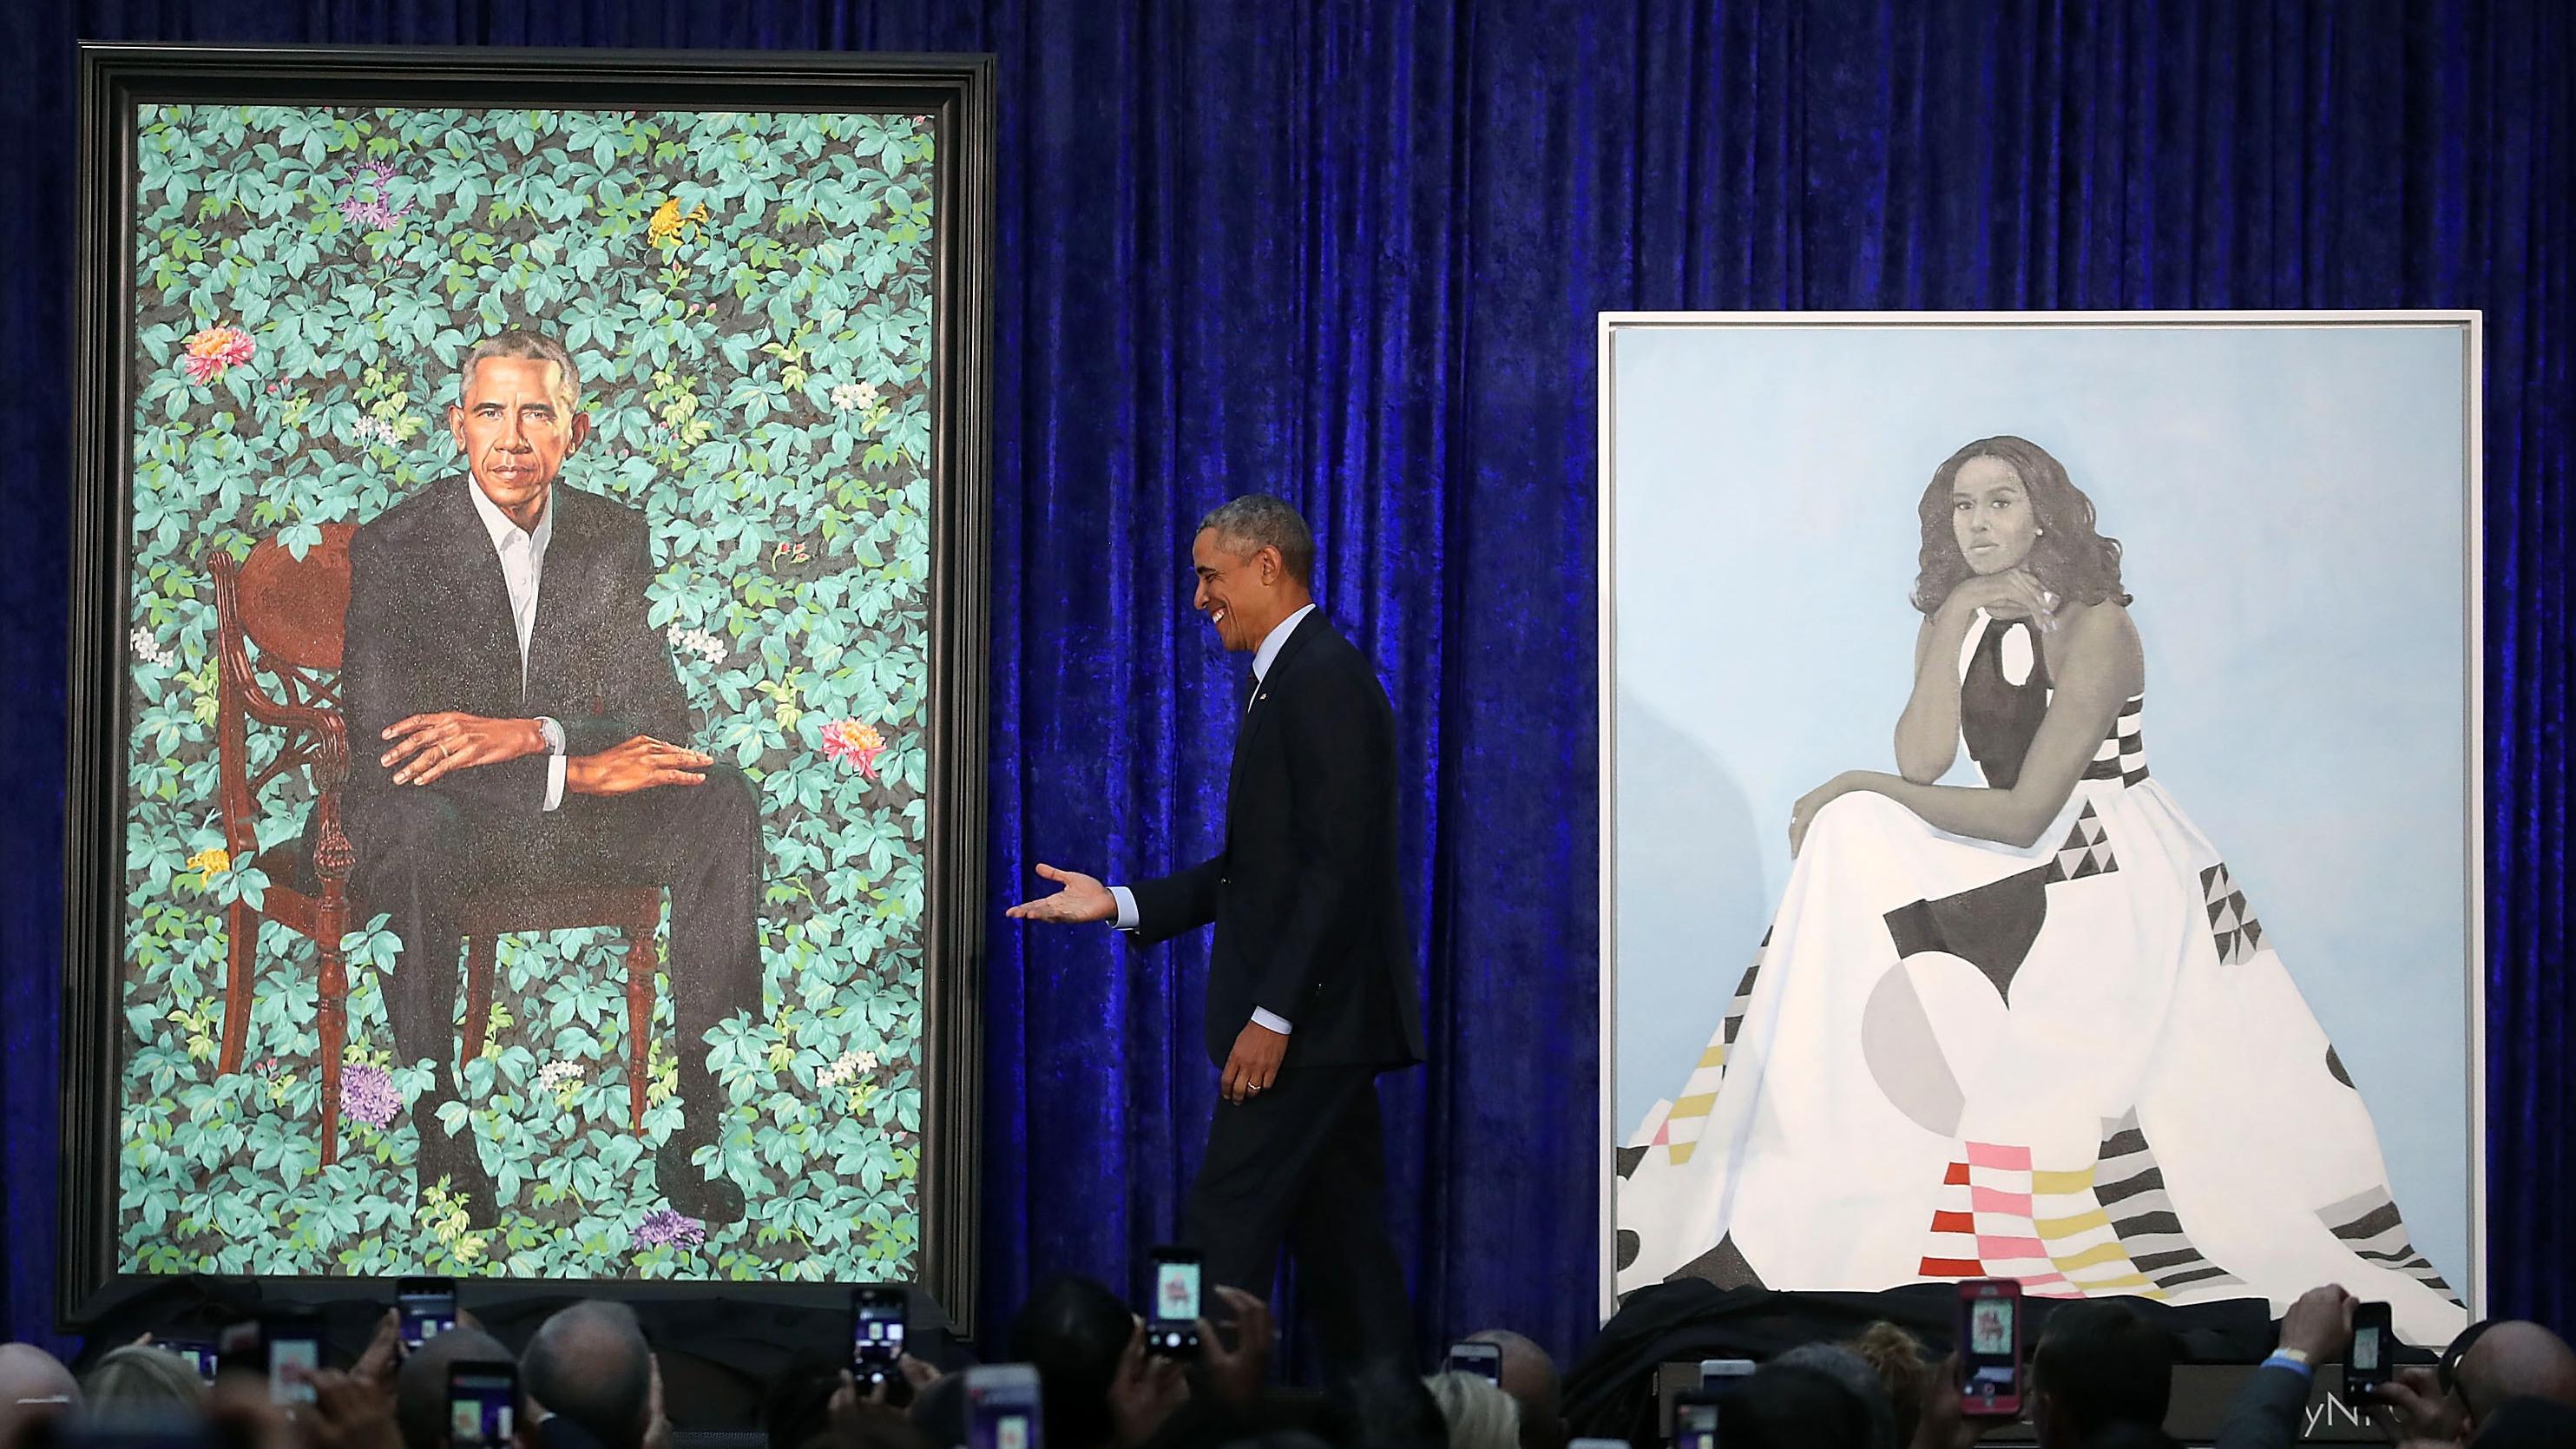 Presidential portraits unveiled from washington to obama